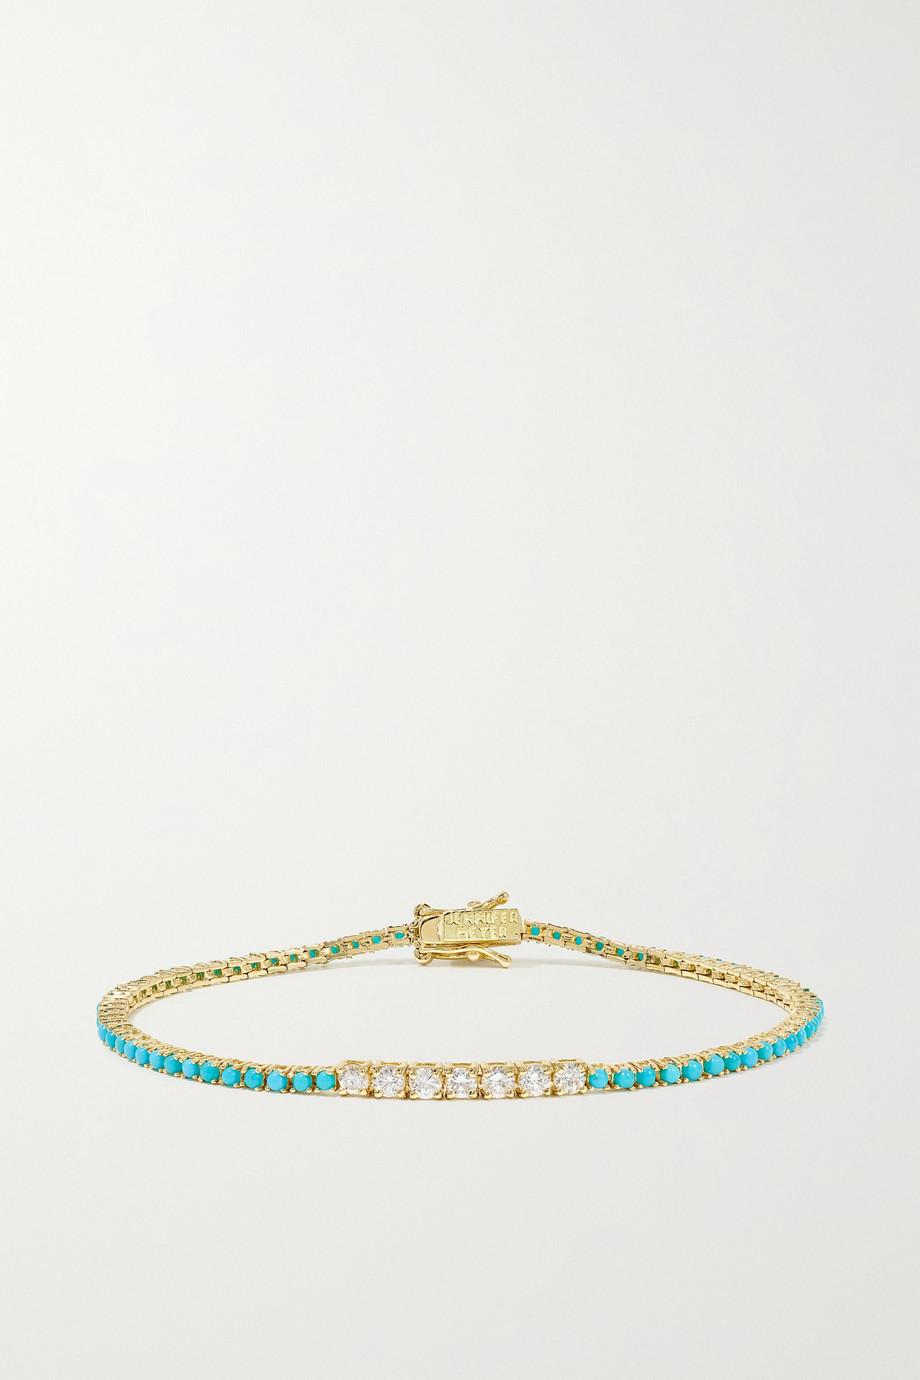 Jennifer Meyer 18-karat gold, diamond and turquoise bracelet